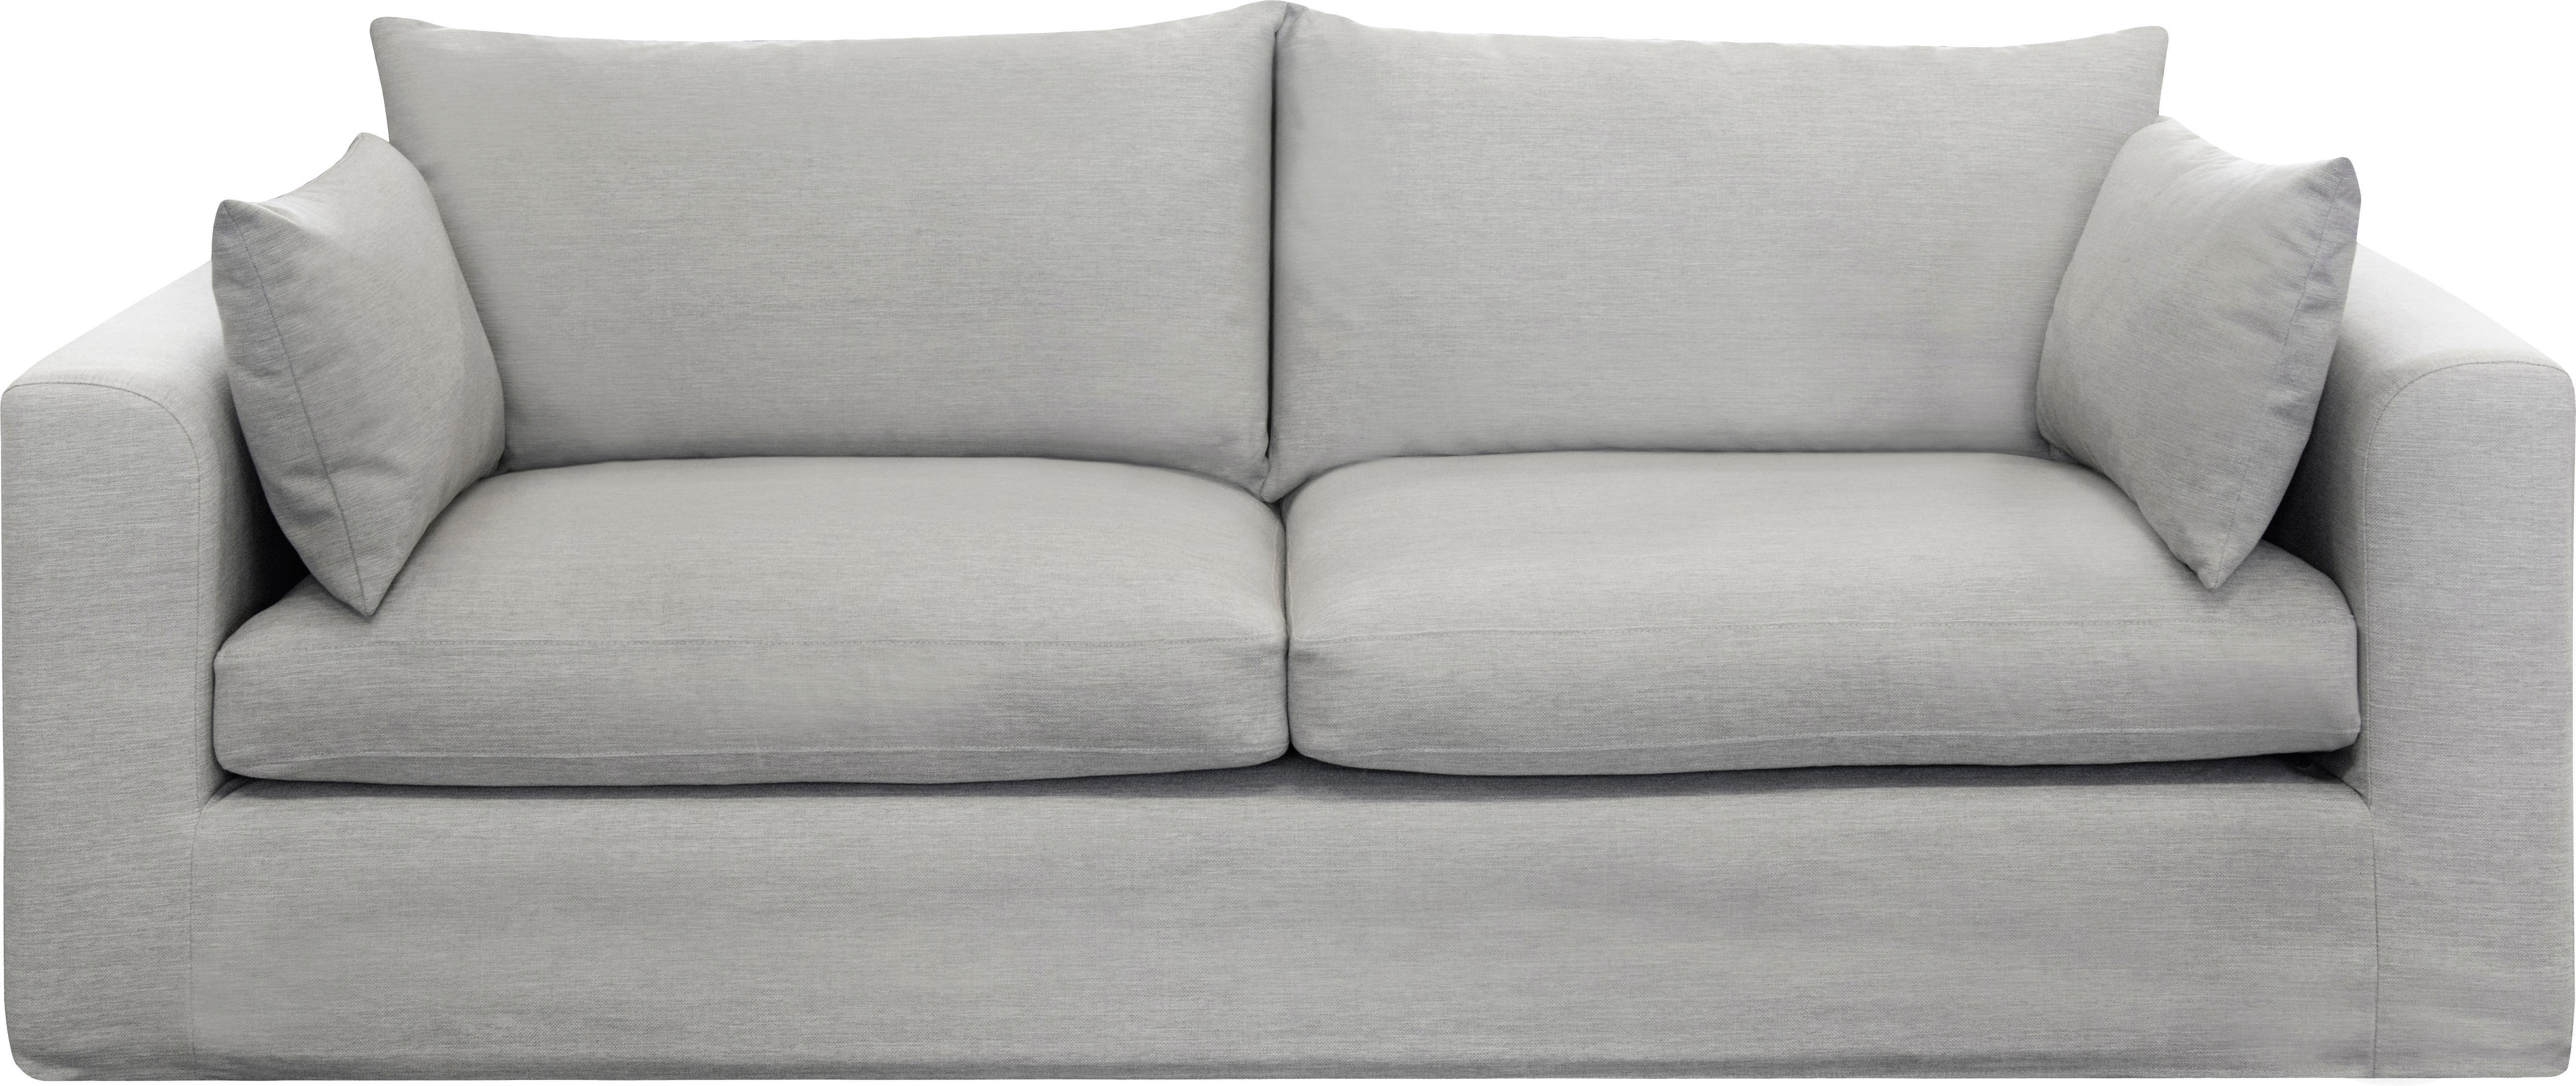 Sofa Zach (3-Sitzer), Bezug: 100% Polypropylen, Webstoff Taupe, B 231 x T 90 cm